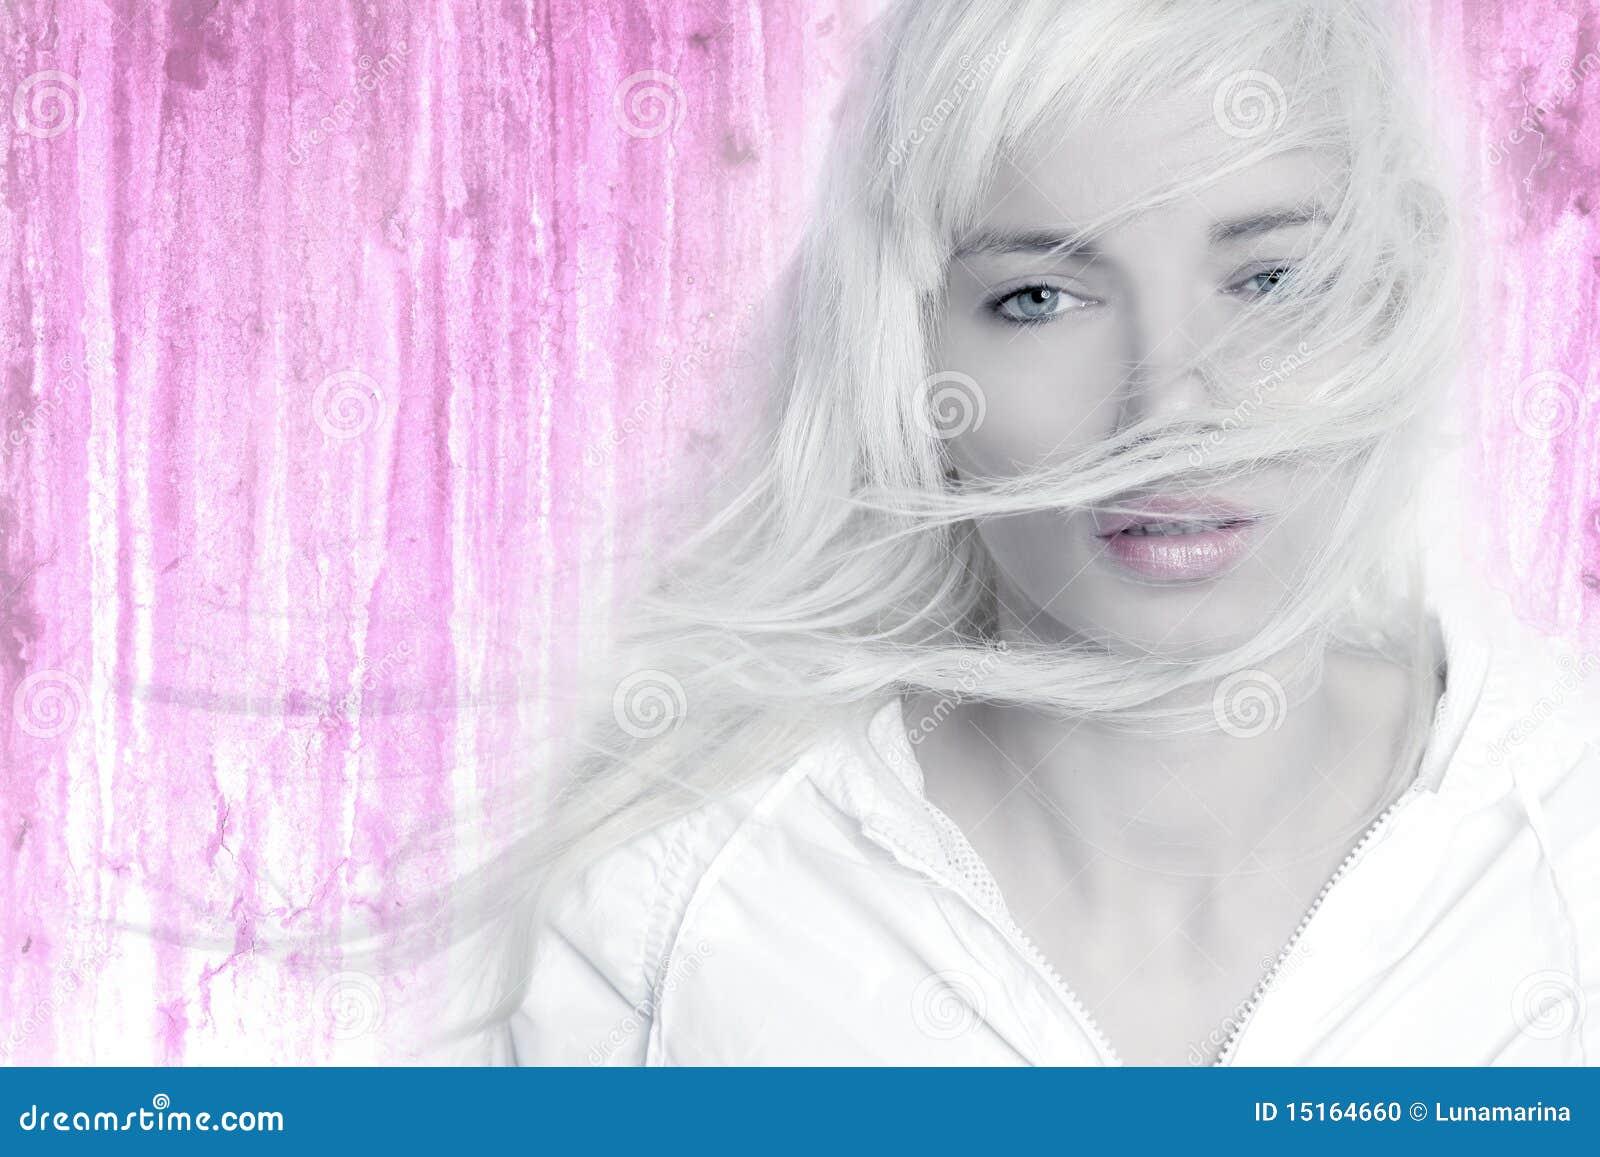 Blonde girl wind long hair flying pink